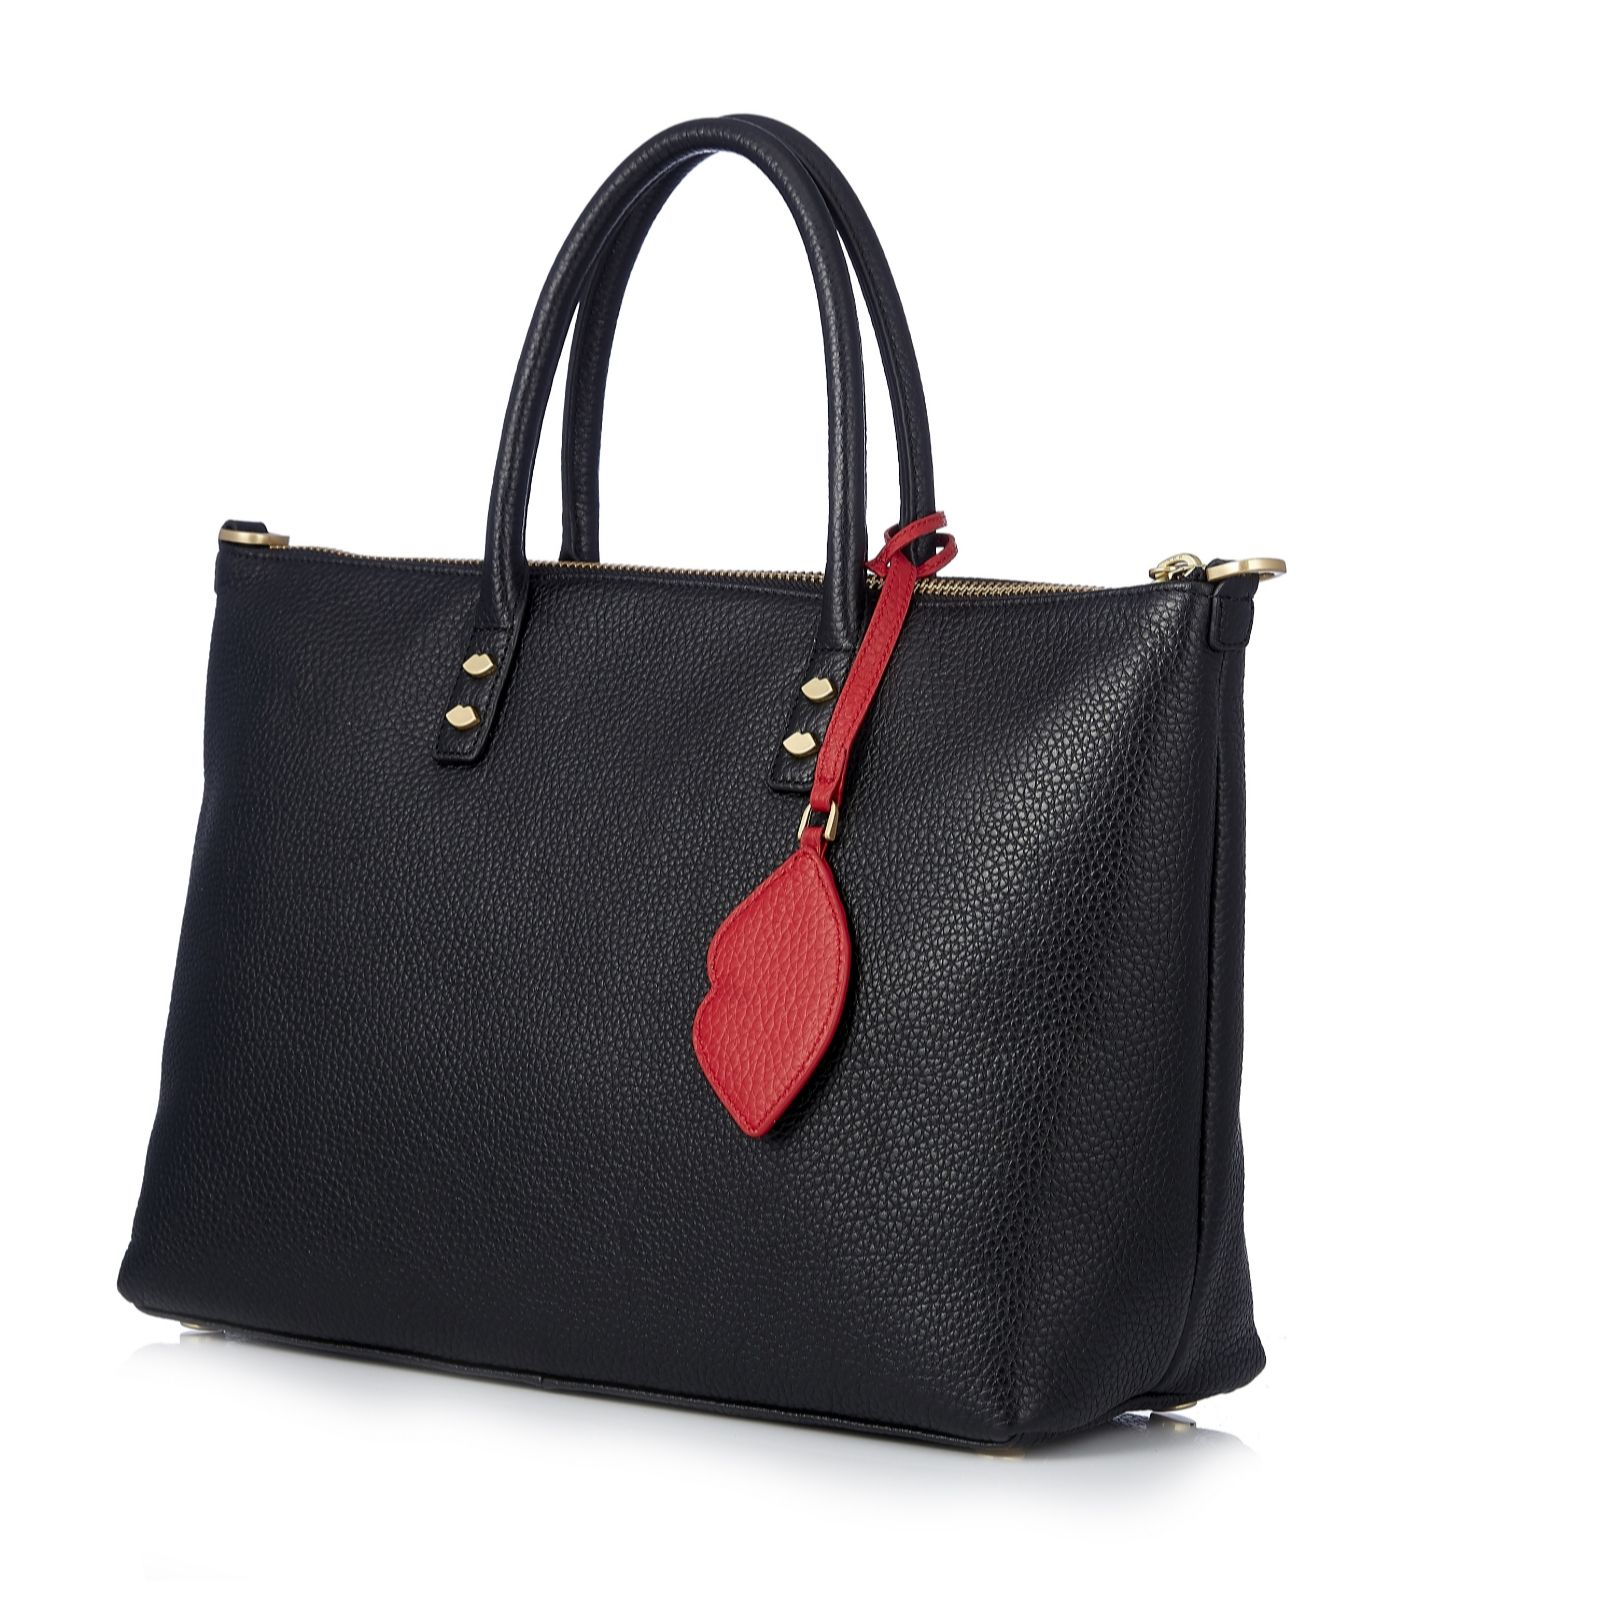 Lulu Guinness Frances Medium Lip Zip Leather Tote Bag With Detachable Strap Qvc Uk